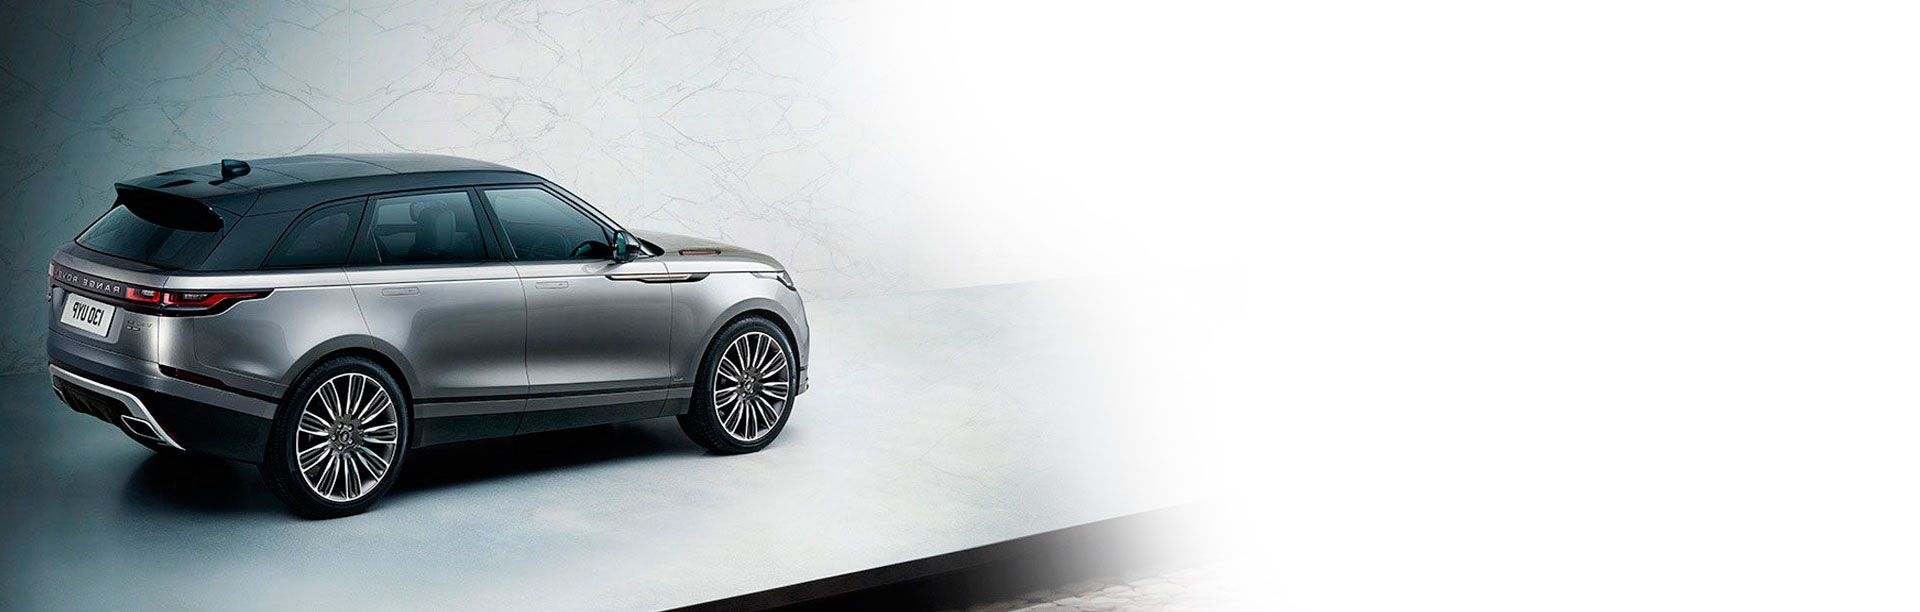 Магазин запчастей Land Rover LR West